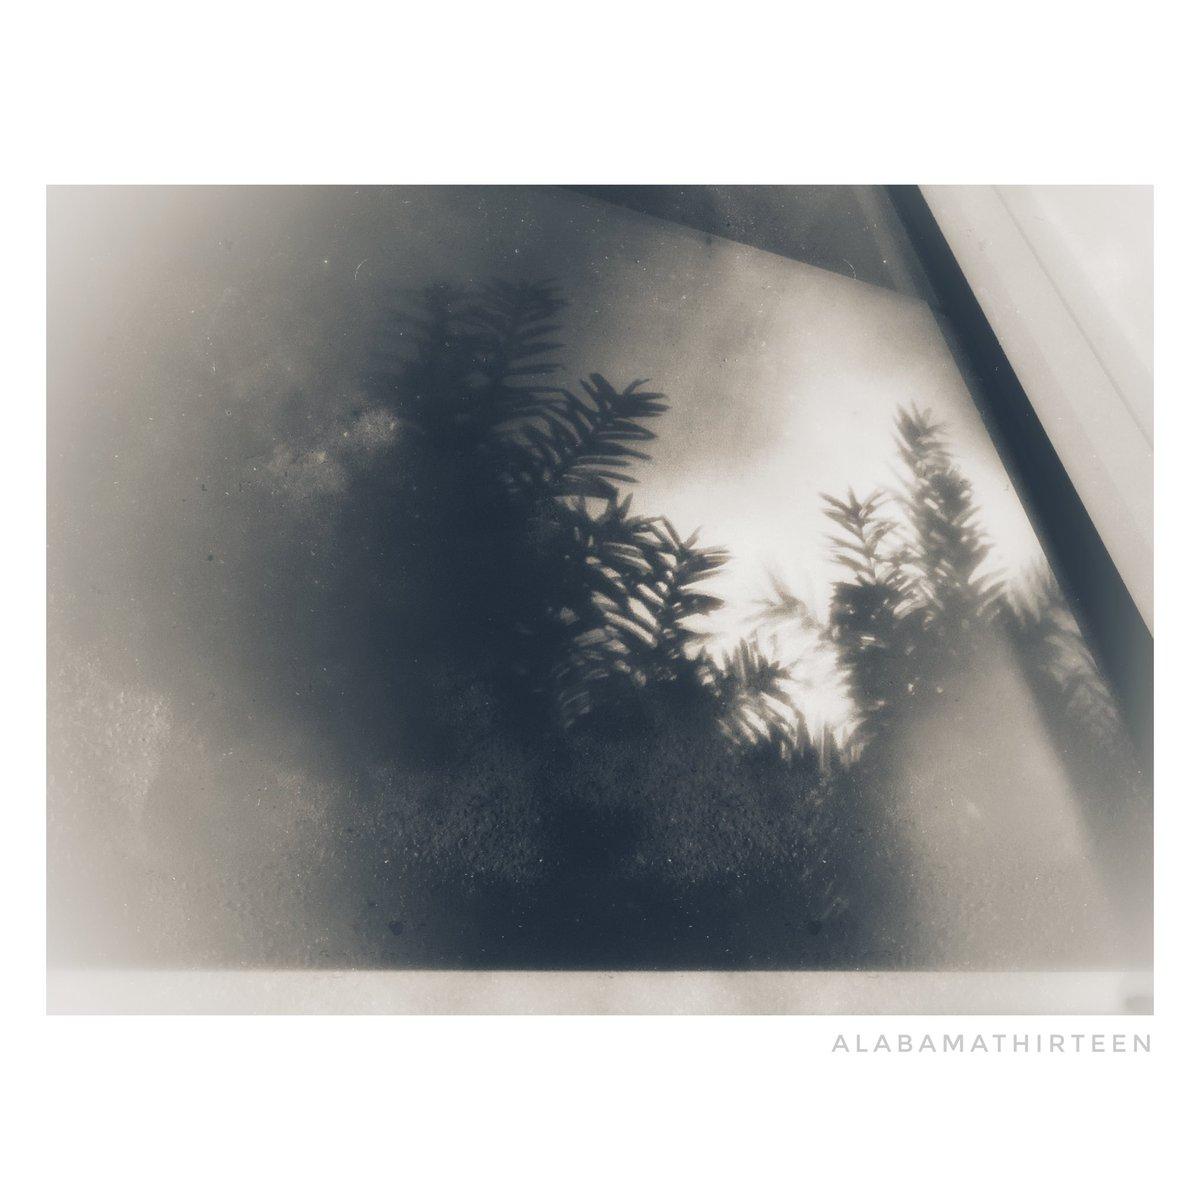 Hospital Beds | 091119 ___ #hospital #theviewfrommyhospitalbed #blackandwhitephotography #throughthewindow #shadows #bnw #monochrome #sickgirlsclub #fineartphotography #noir_shotspic.twitter.com/qJiqAr7HX1